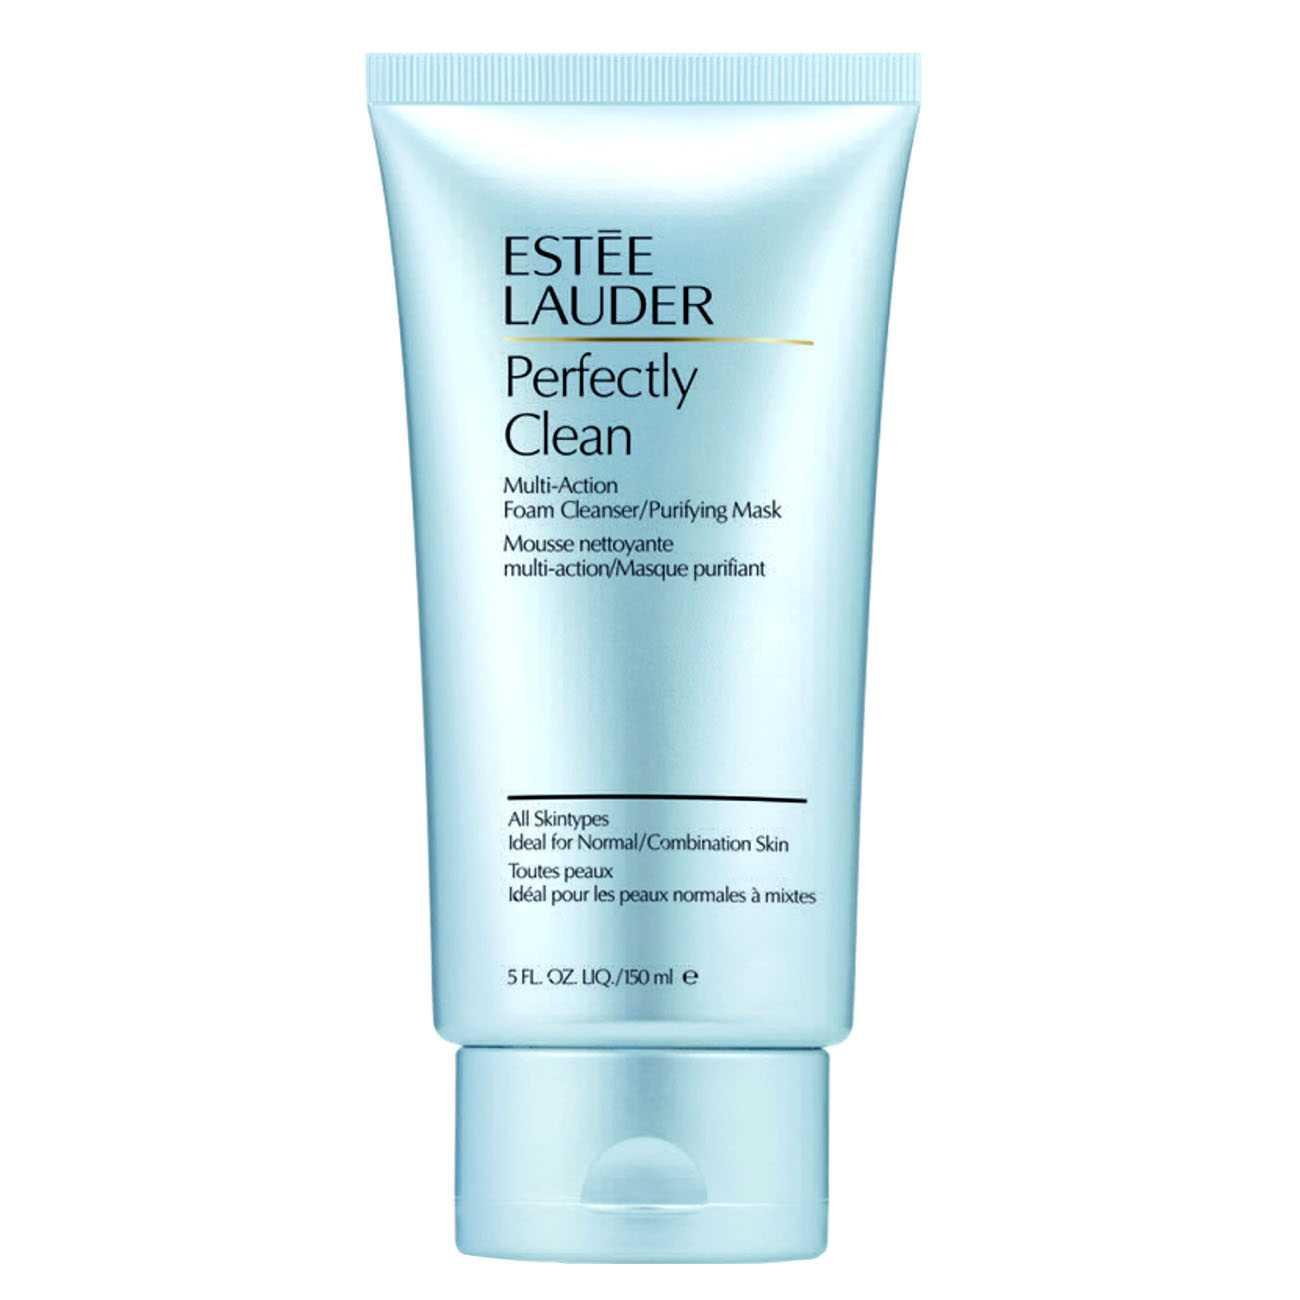 PERFECTLY CLEAN FOAM CLEANSER 150 ML